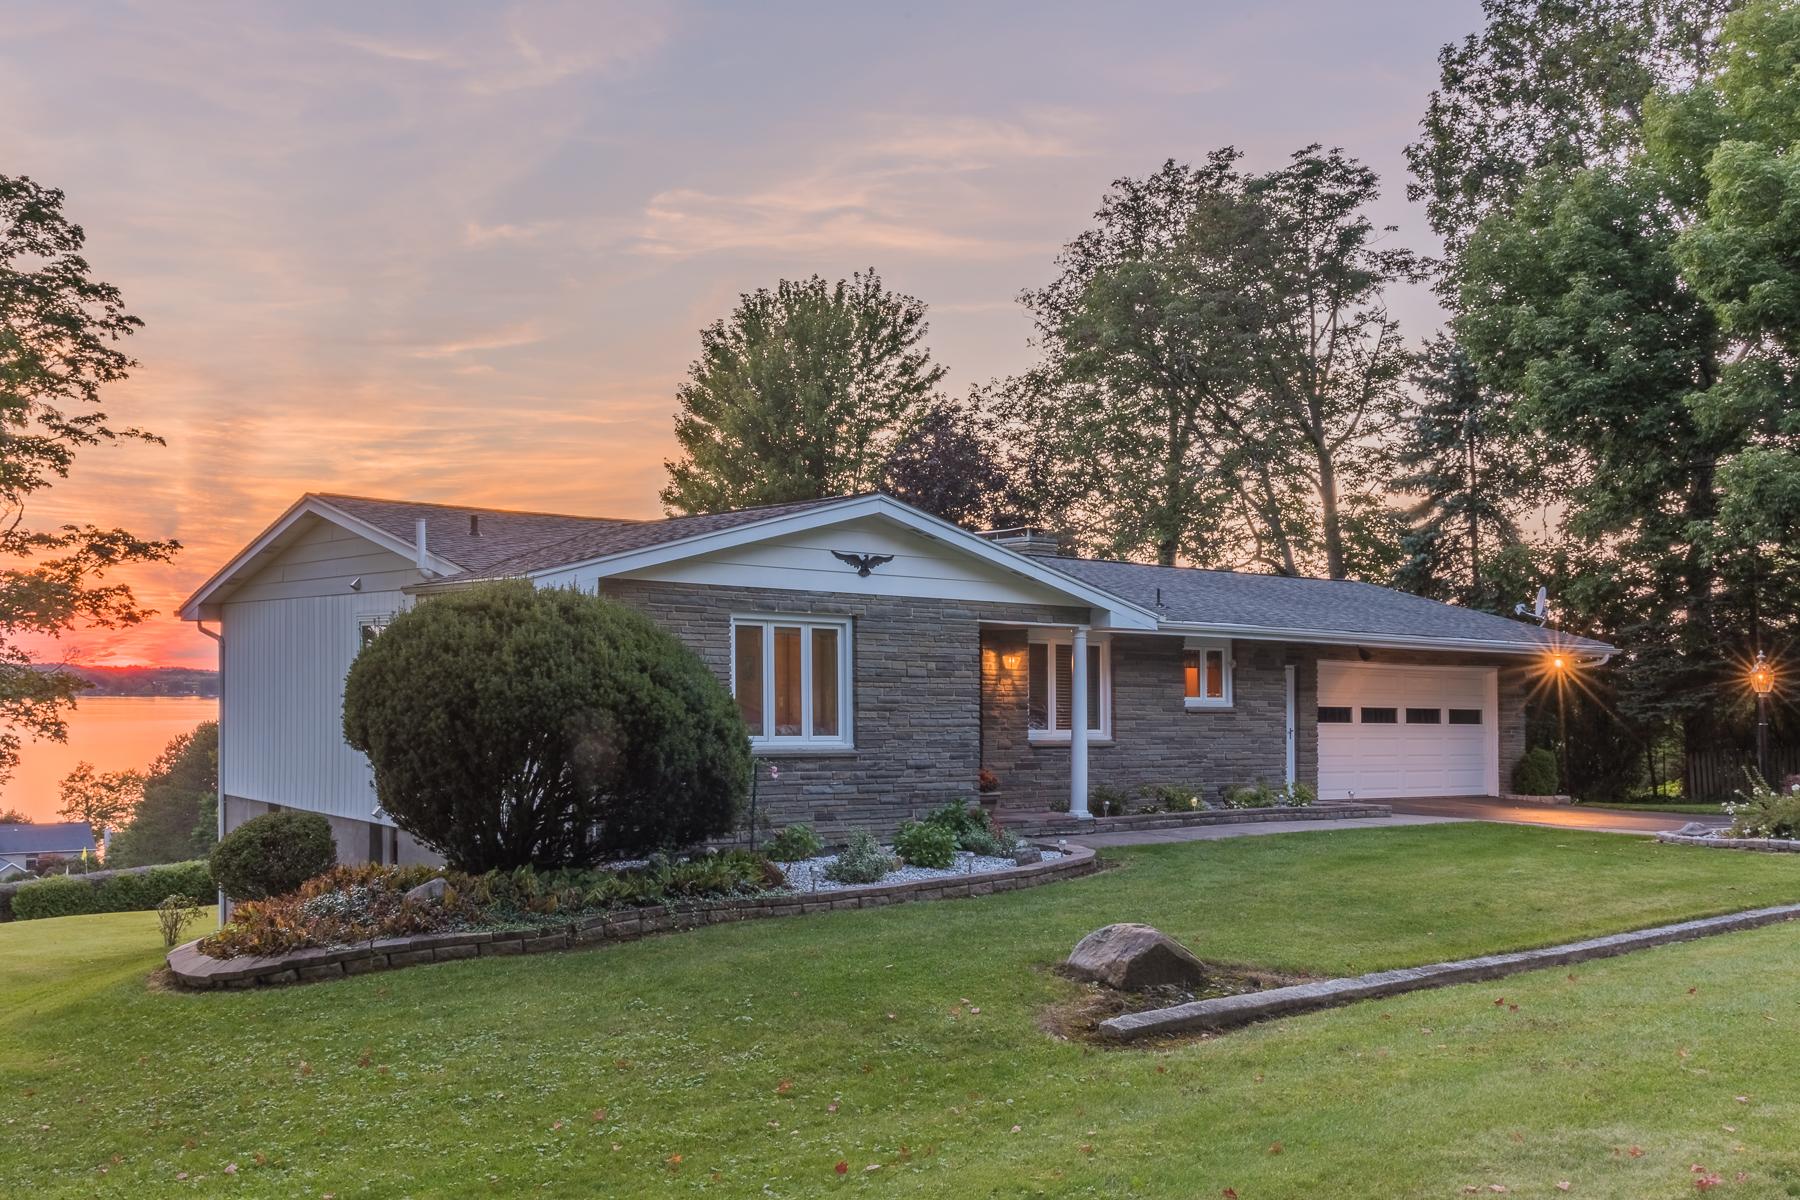 独户住宅 为 销售 在 Updated Ranch with Lake Views 6109 E Lake Rd Owasco, 纽约州 13021 美国